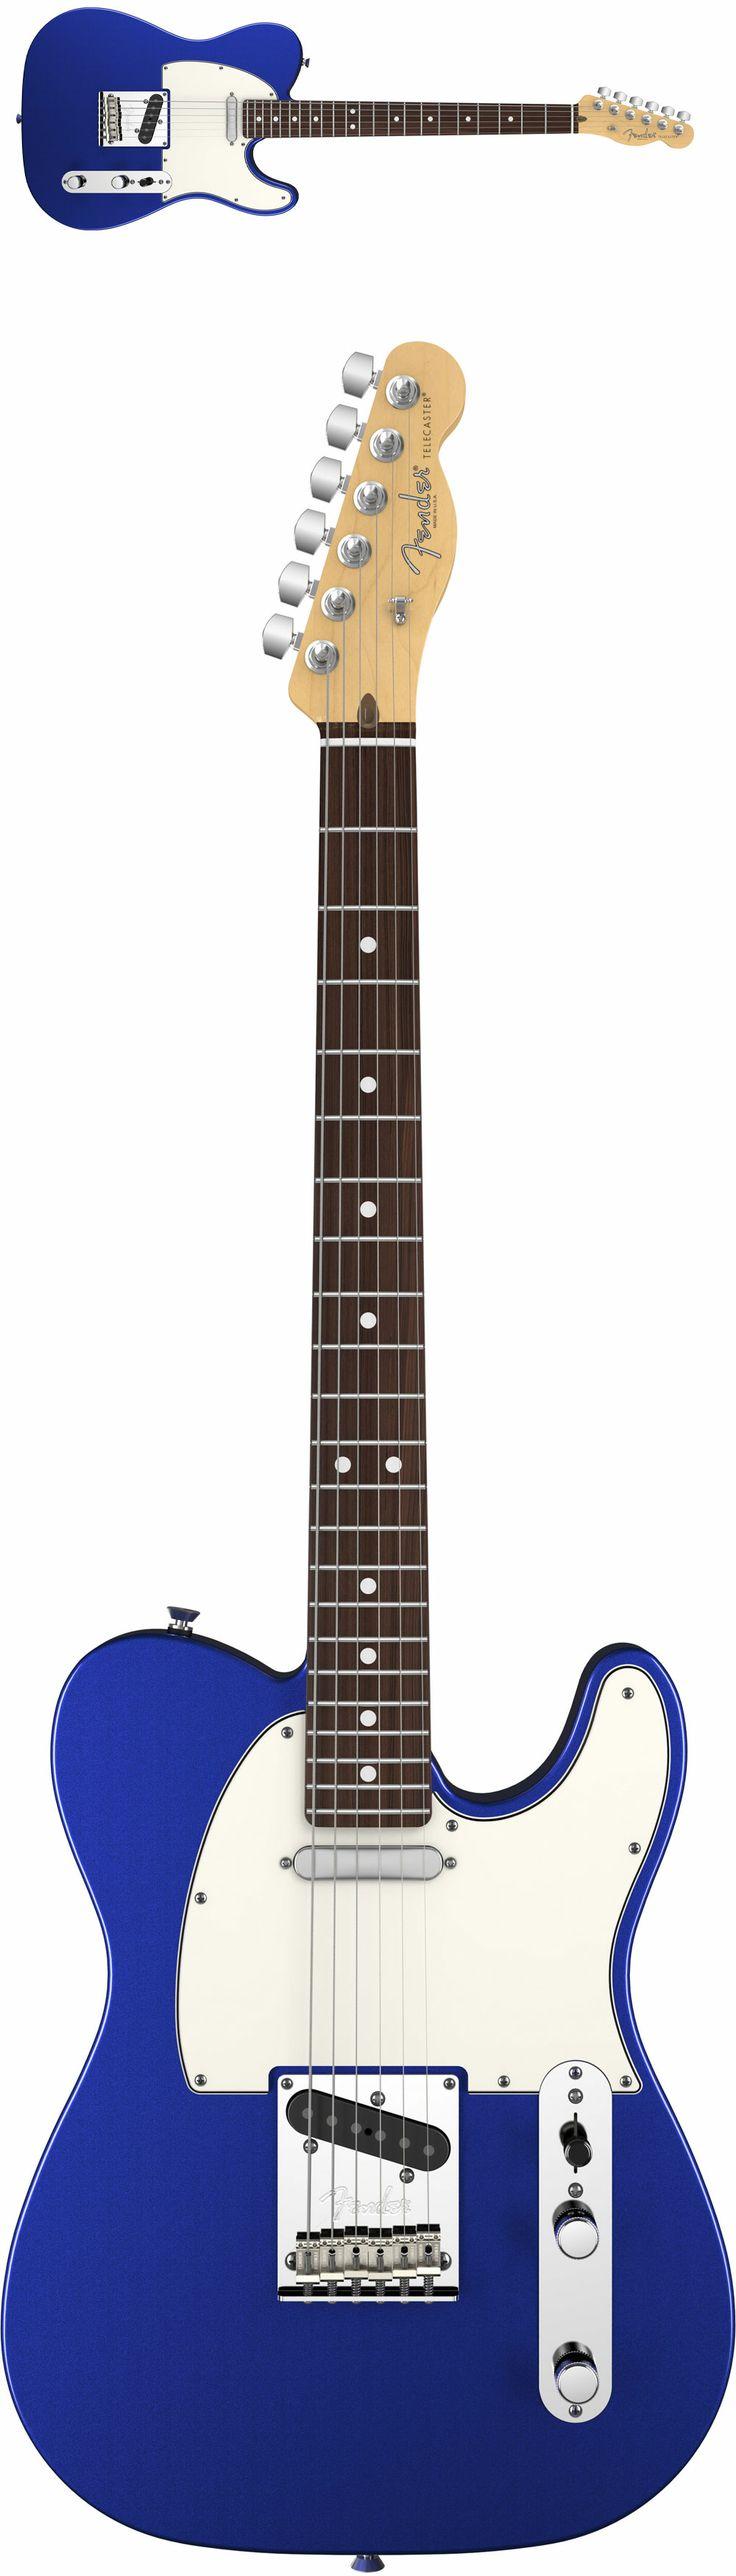 Fender American Standard HSS Stratocaster 2012 Mystic Blue Rosewood